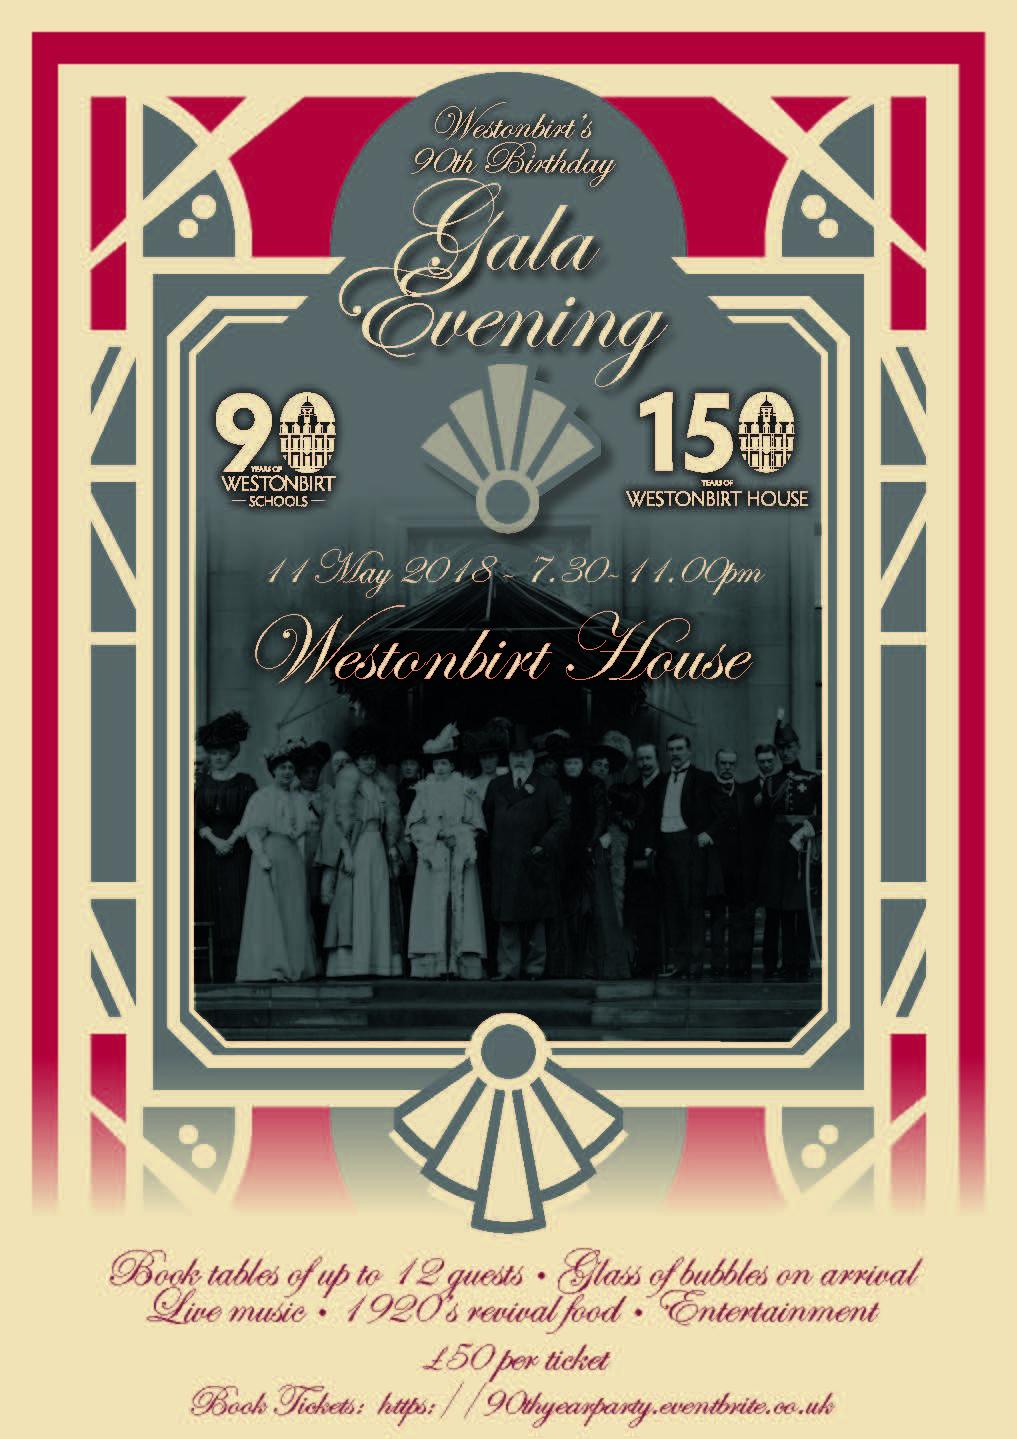 Westonbirt 90th Birthday Gala Evening